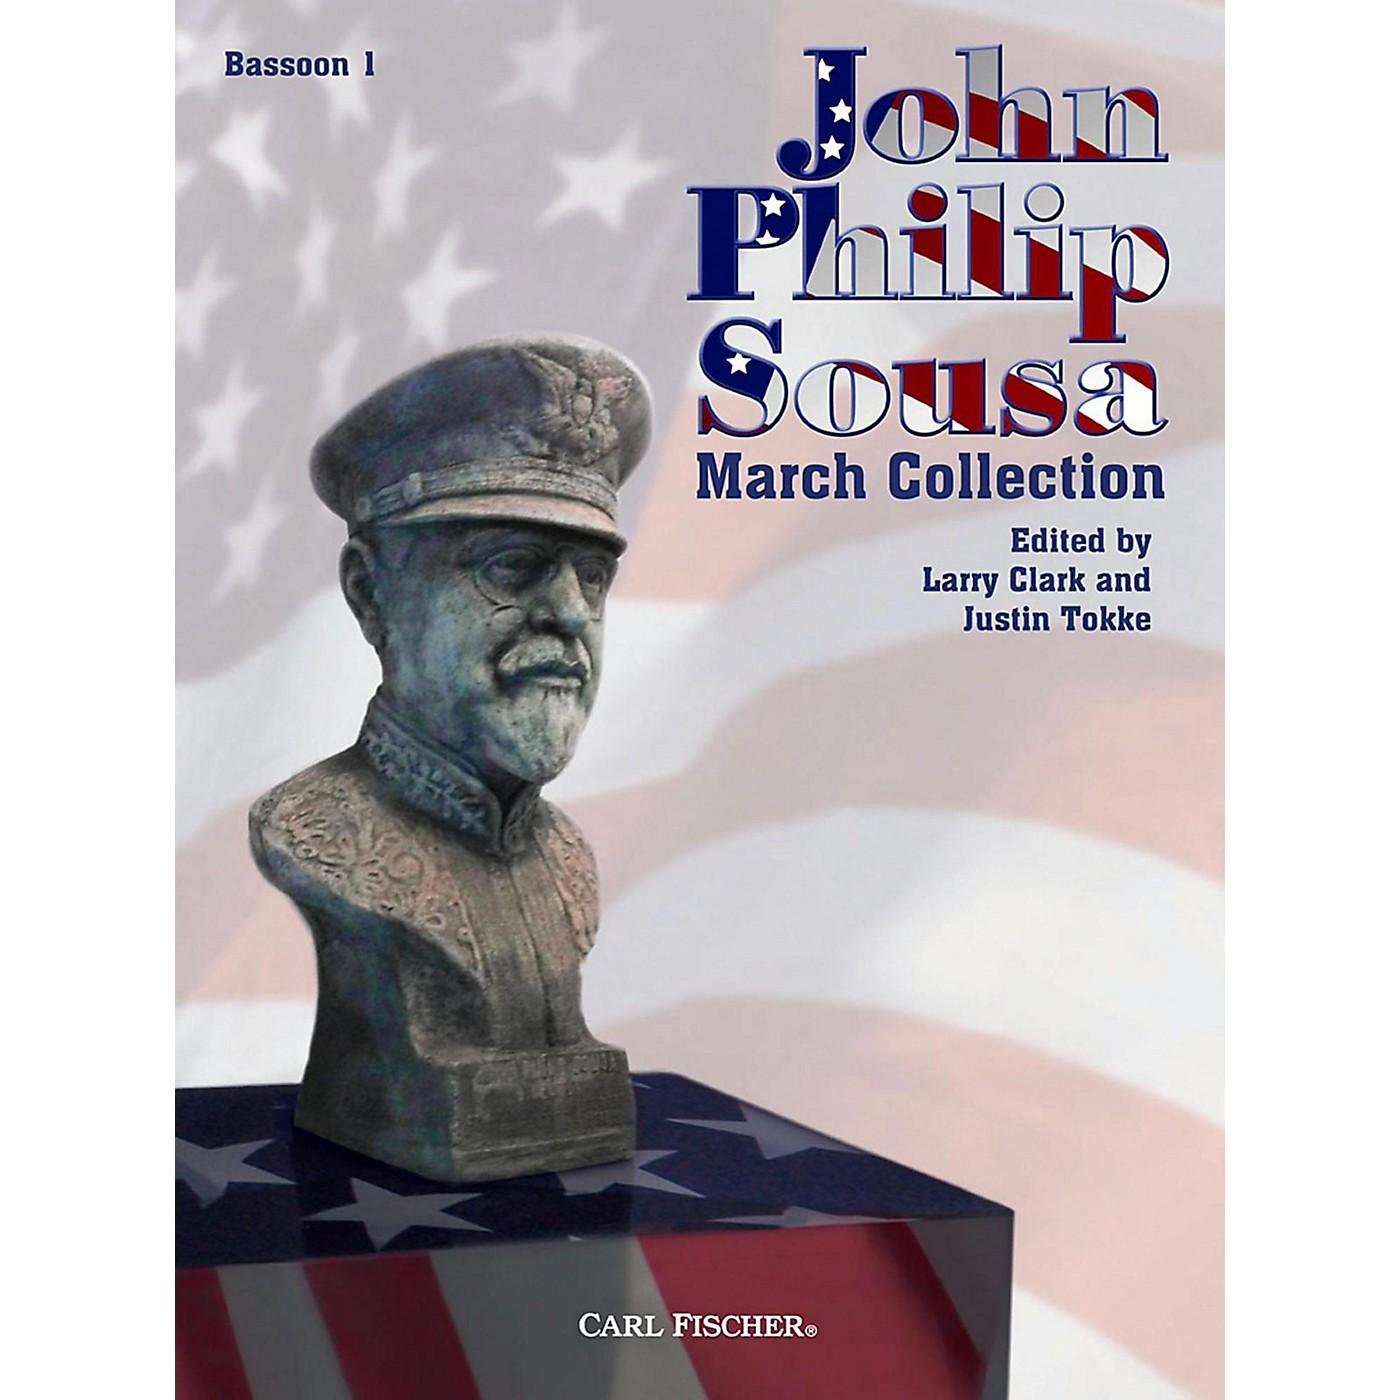 Carl Fischer John Philip Sousa March Collection - Bassoon 1 thumbnail